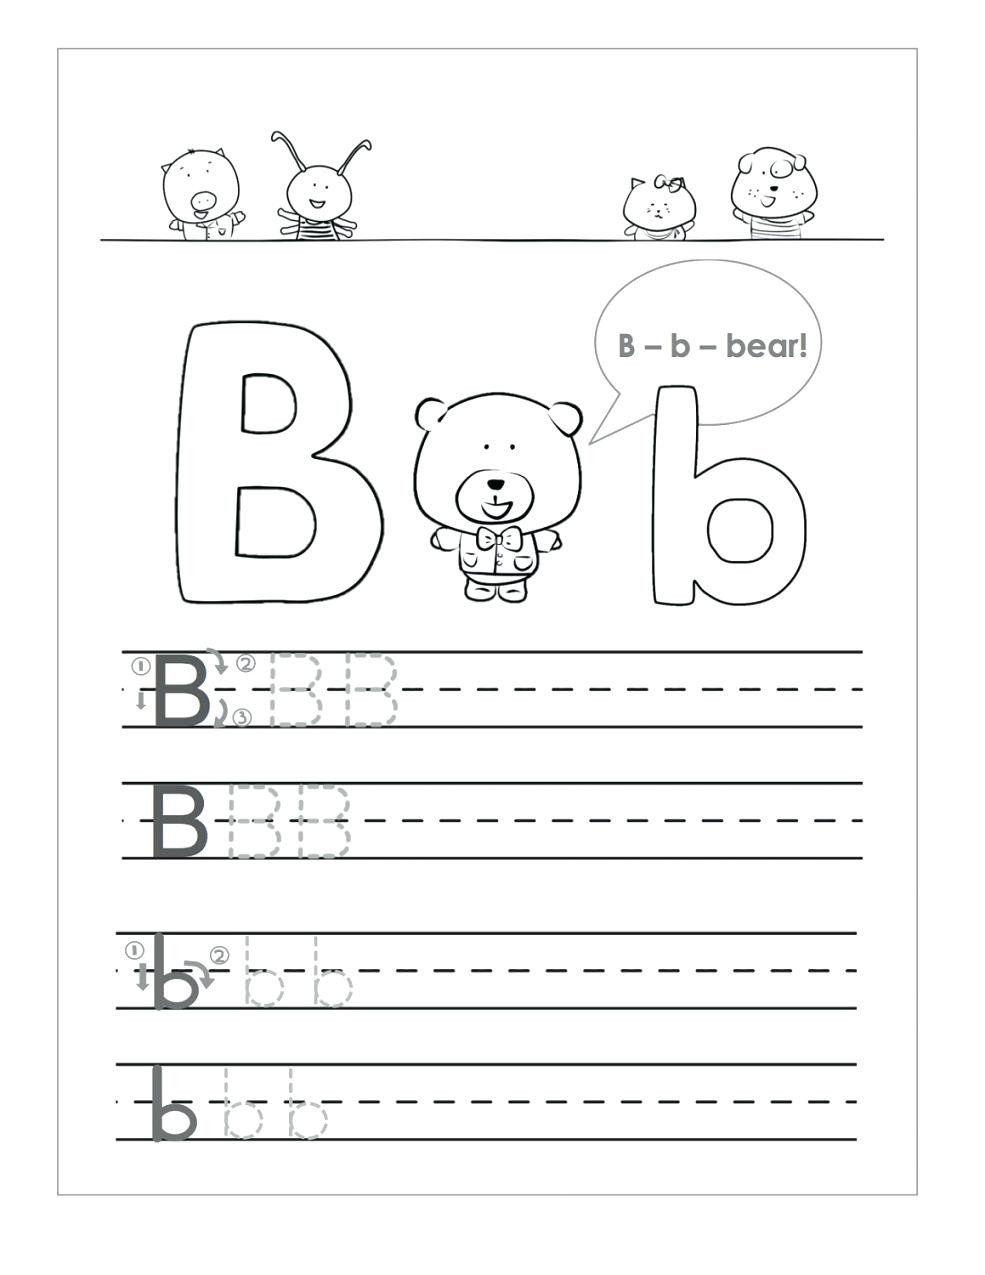 Preschool Worksheets Letter B Letter B Worksheets To Printable Letter B Worksheets In 2020 Letter B Worksheets Kindergarten Phonics Worksheets Preschool Worksheets